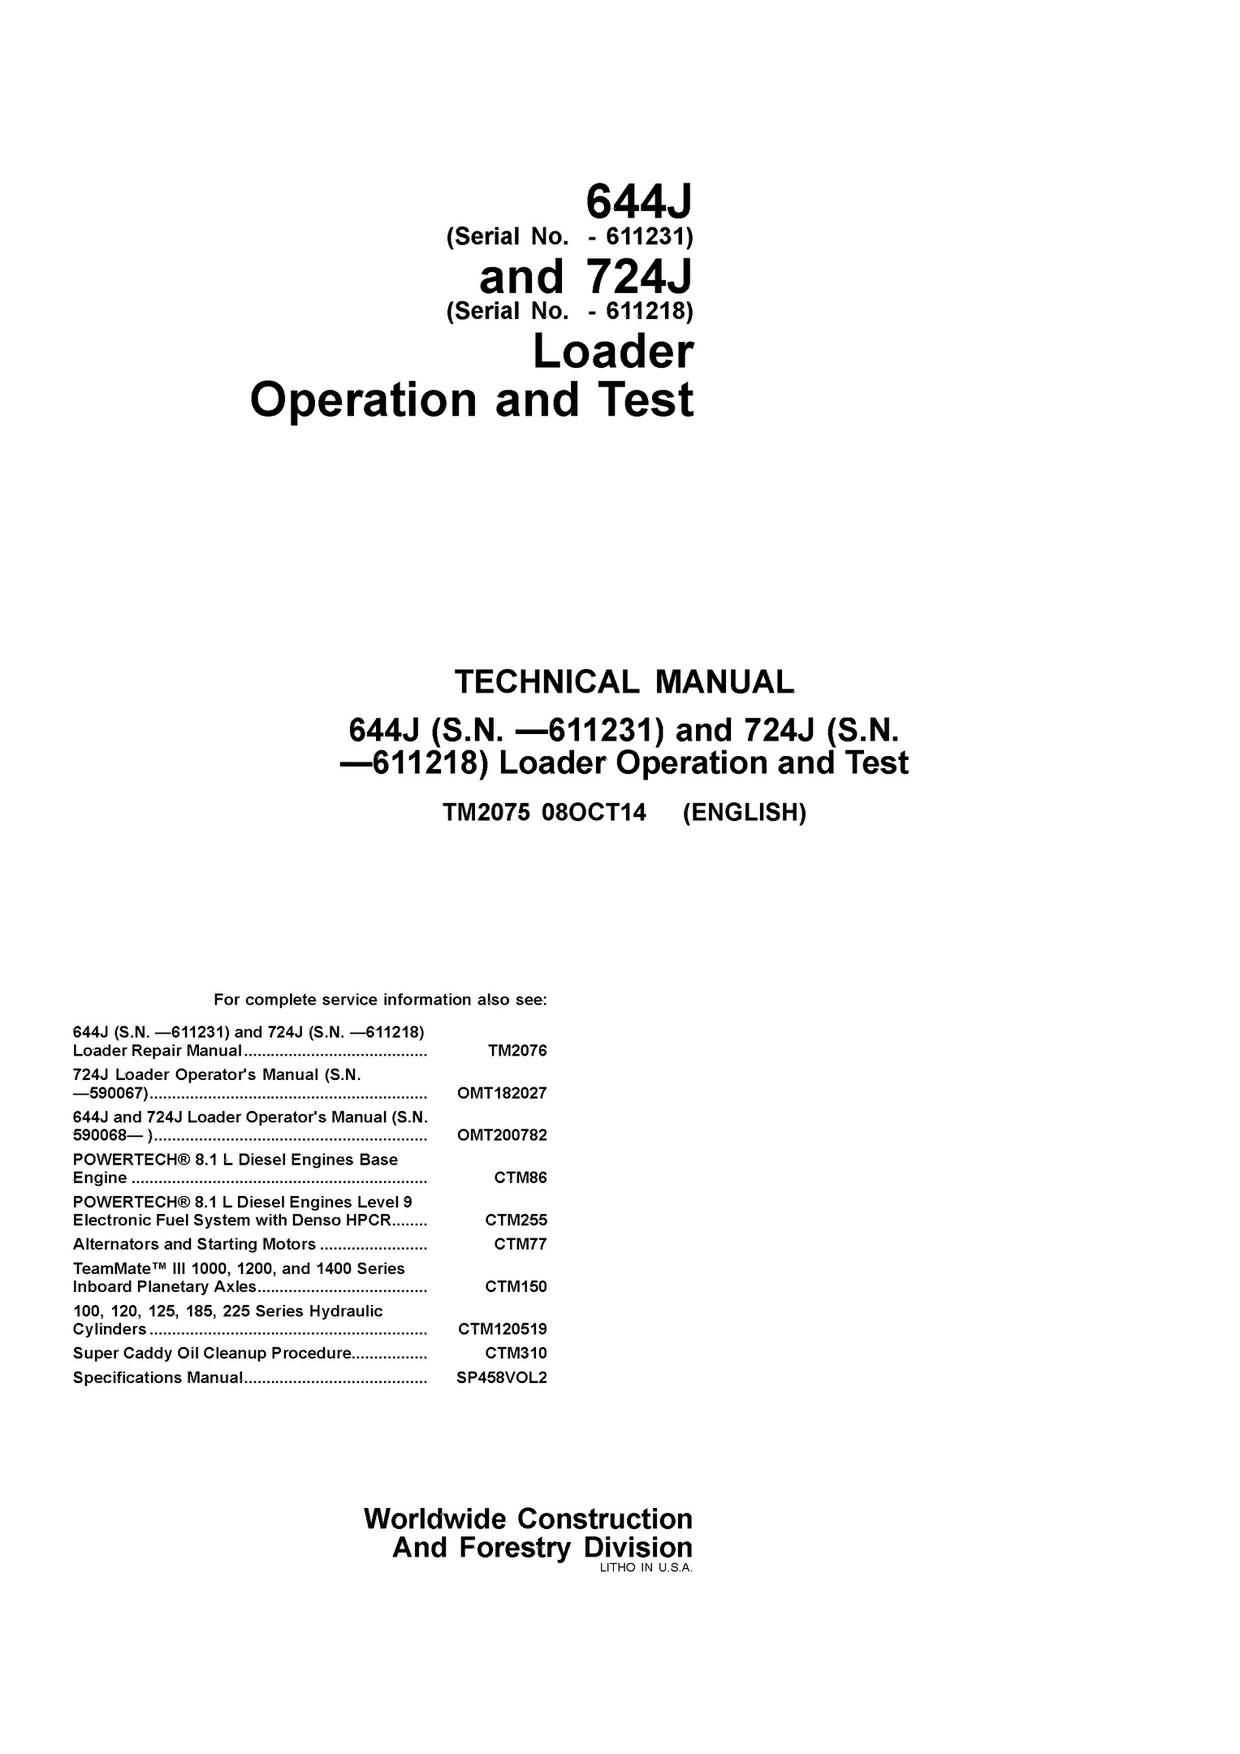 John Deere Jd 310g Backhoe Loader Service Technical Operation Test – La145 Wiring Diagram